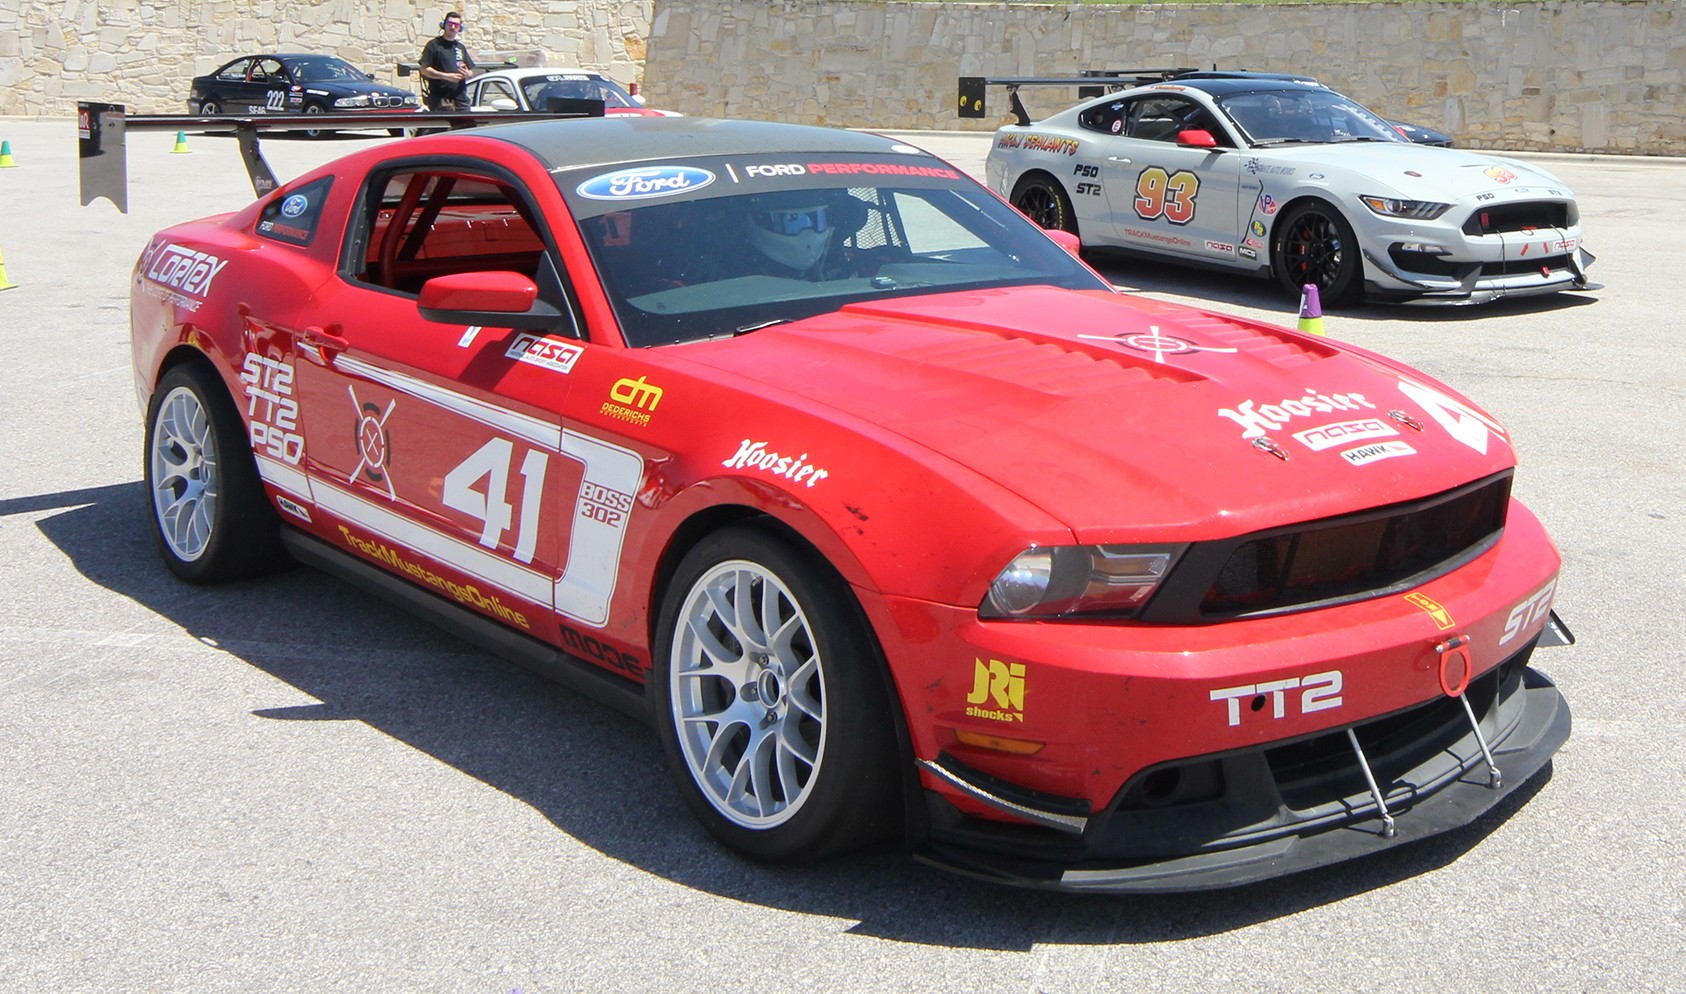 "S197 Square Fitment<br />Wheels: 18x11"" ET52 Race Silver EC-7<br />Tires: 315/30-18 Hoosier A7<br />Mods: 20mm front spacers"